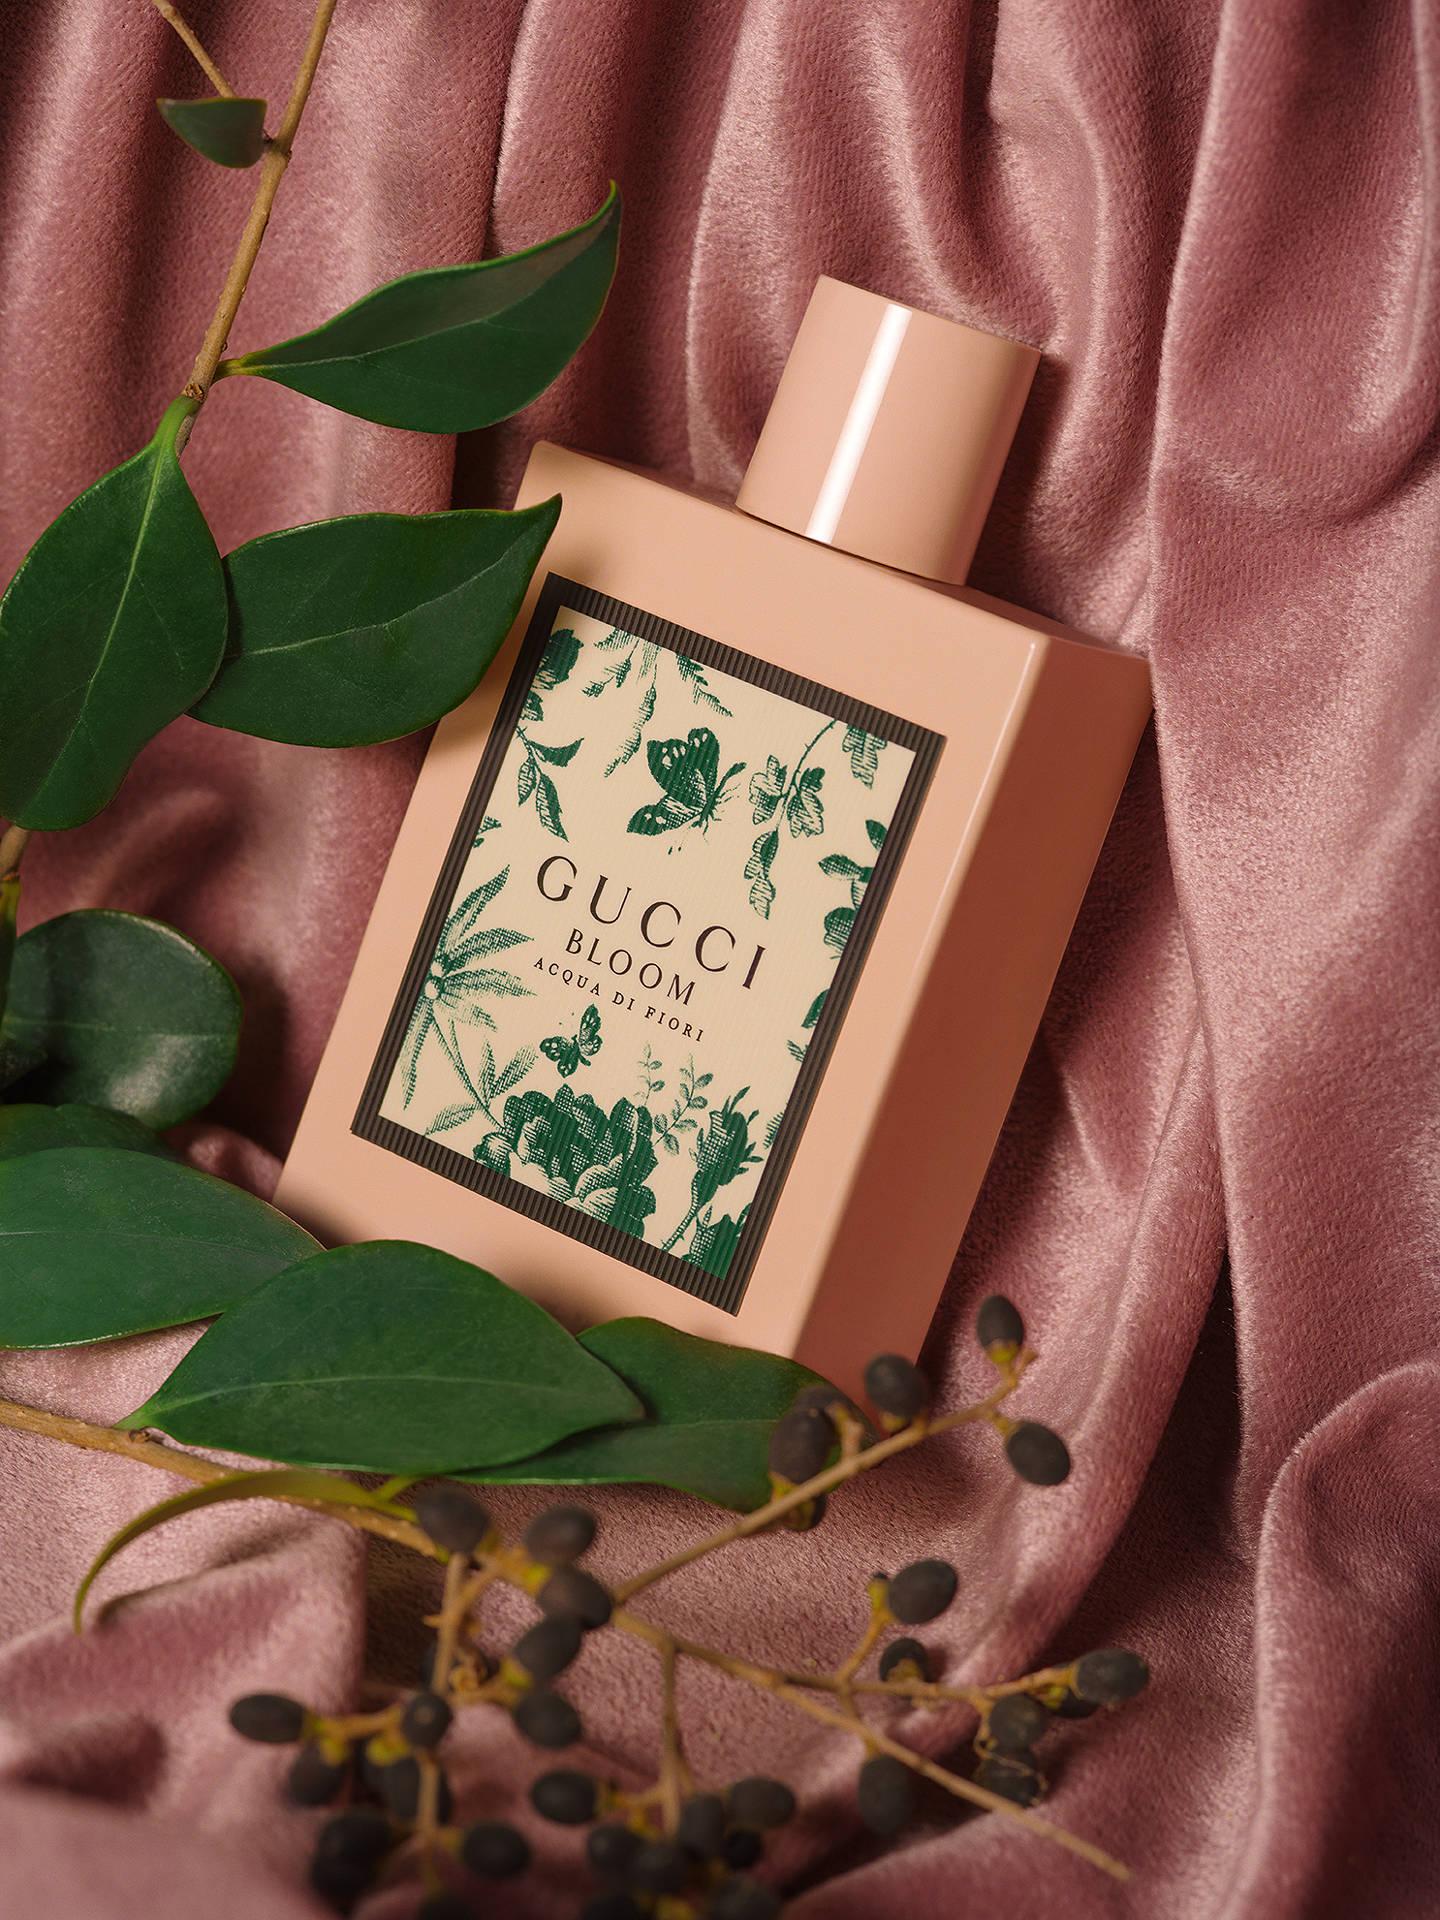 9216046c8b ... Buy Gucci Bloom Acqua Di Fiori Eau de Toilette, 50ml Online at  johnlewis.com